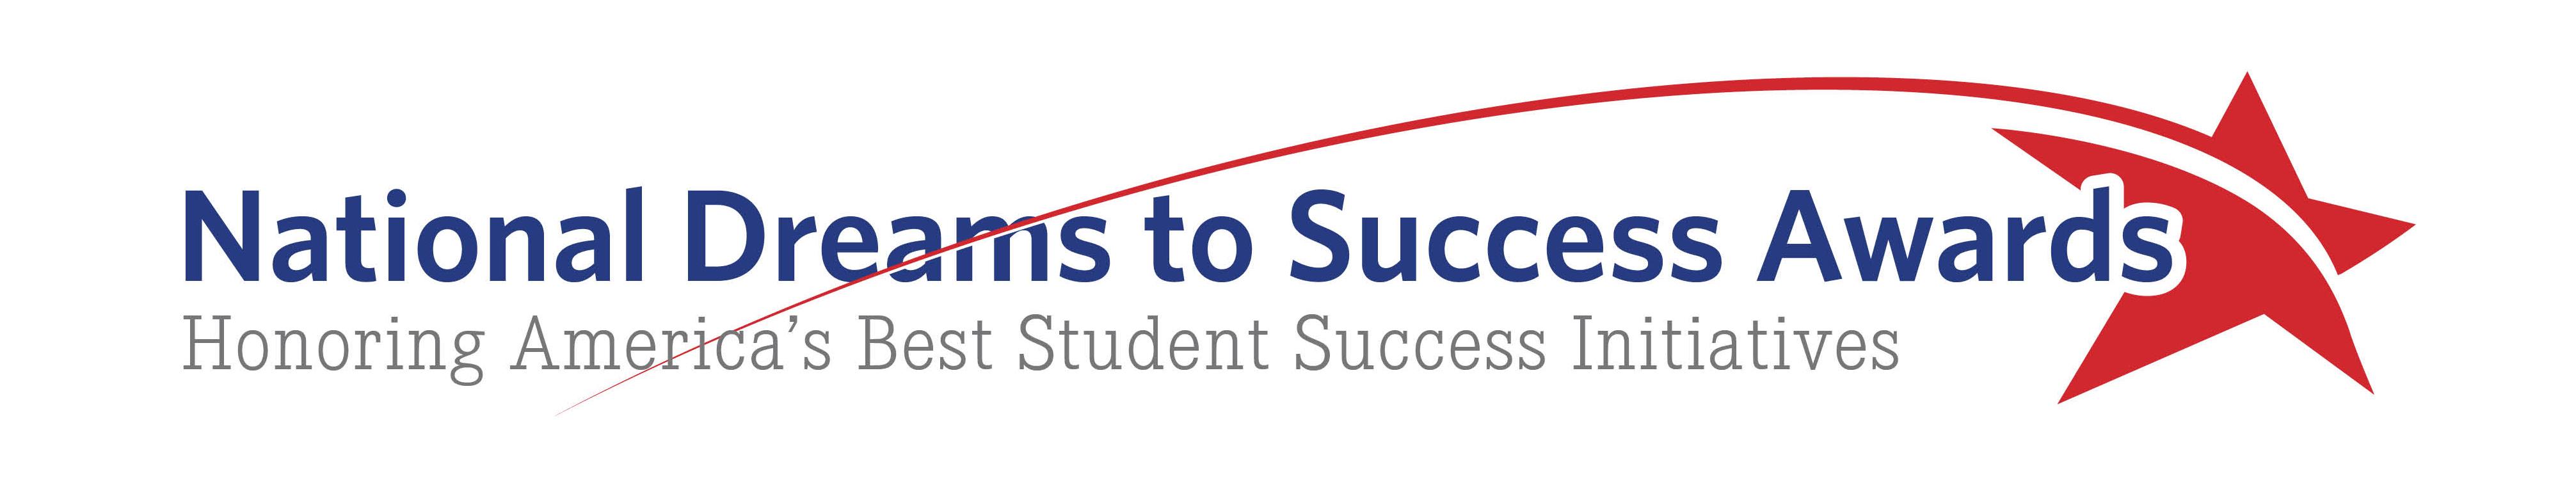 National Dreams to Success Logo